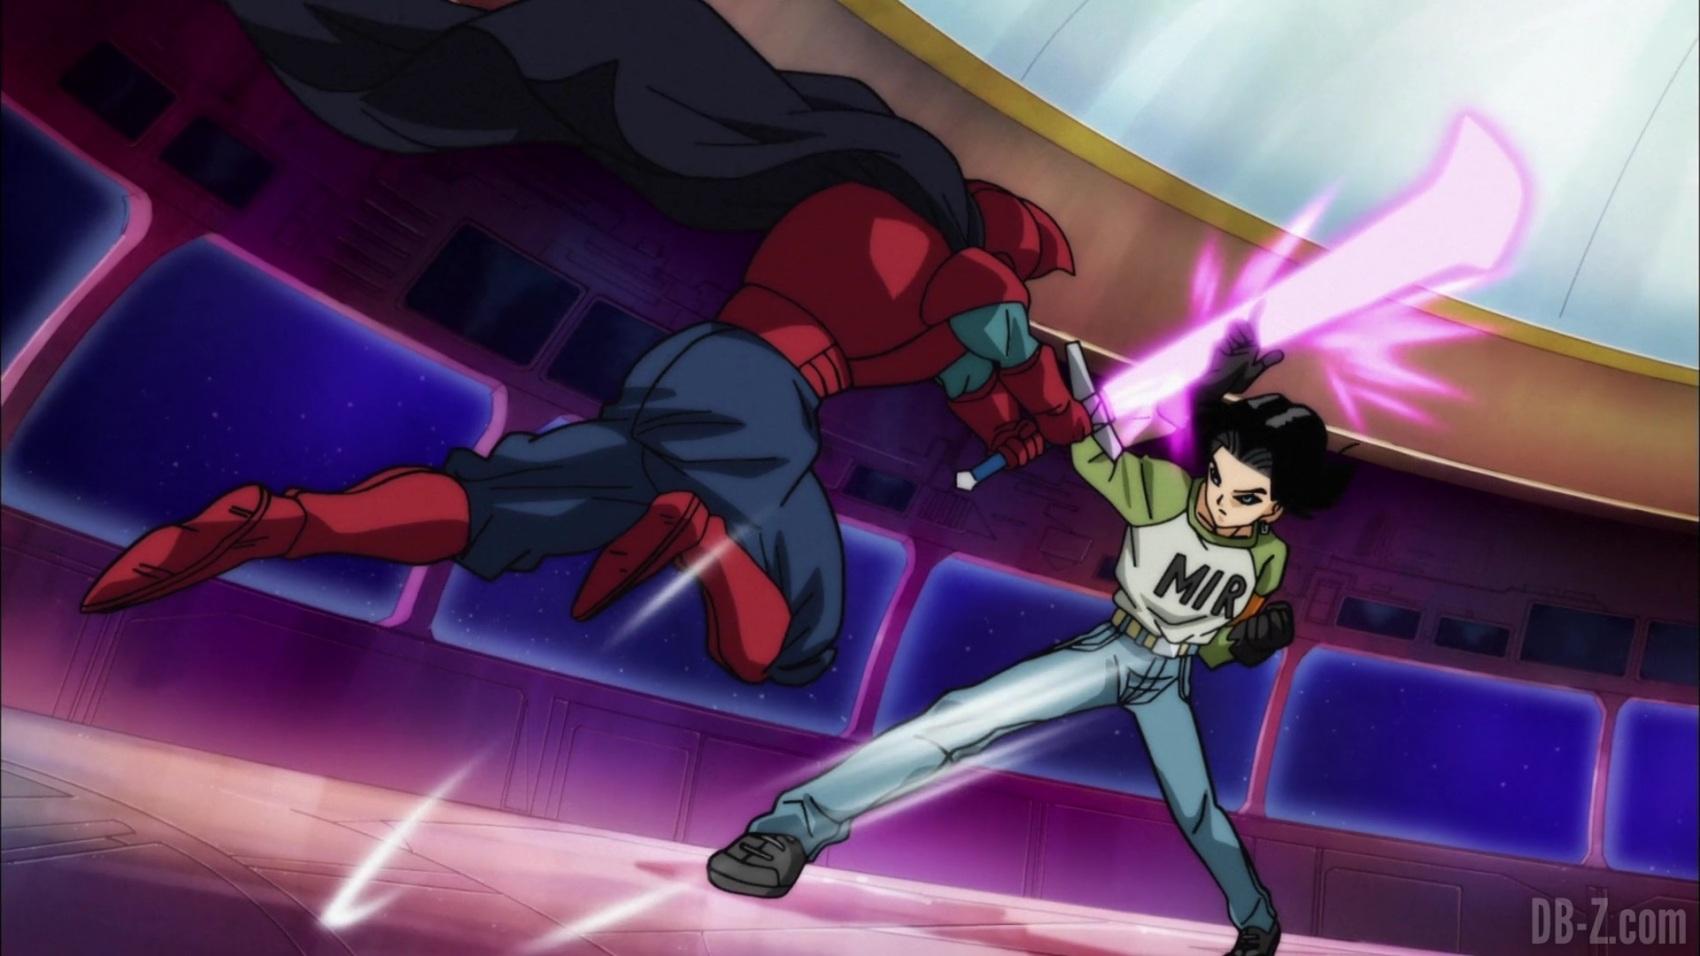 Dragon-Ball-Super-Episode-87-image41